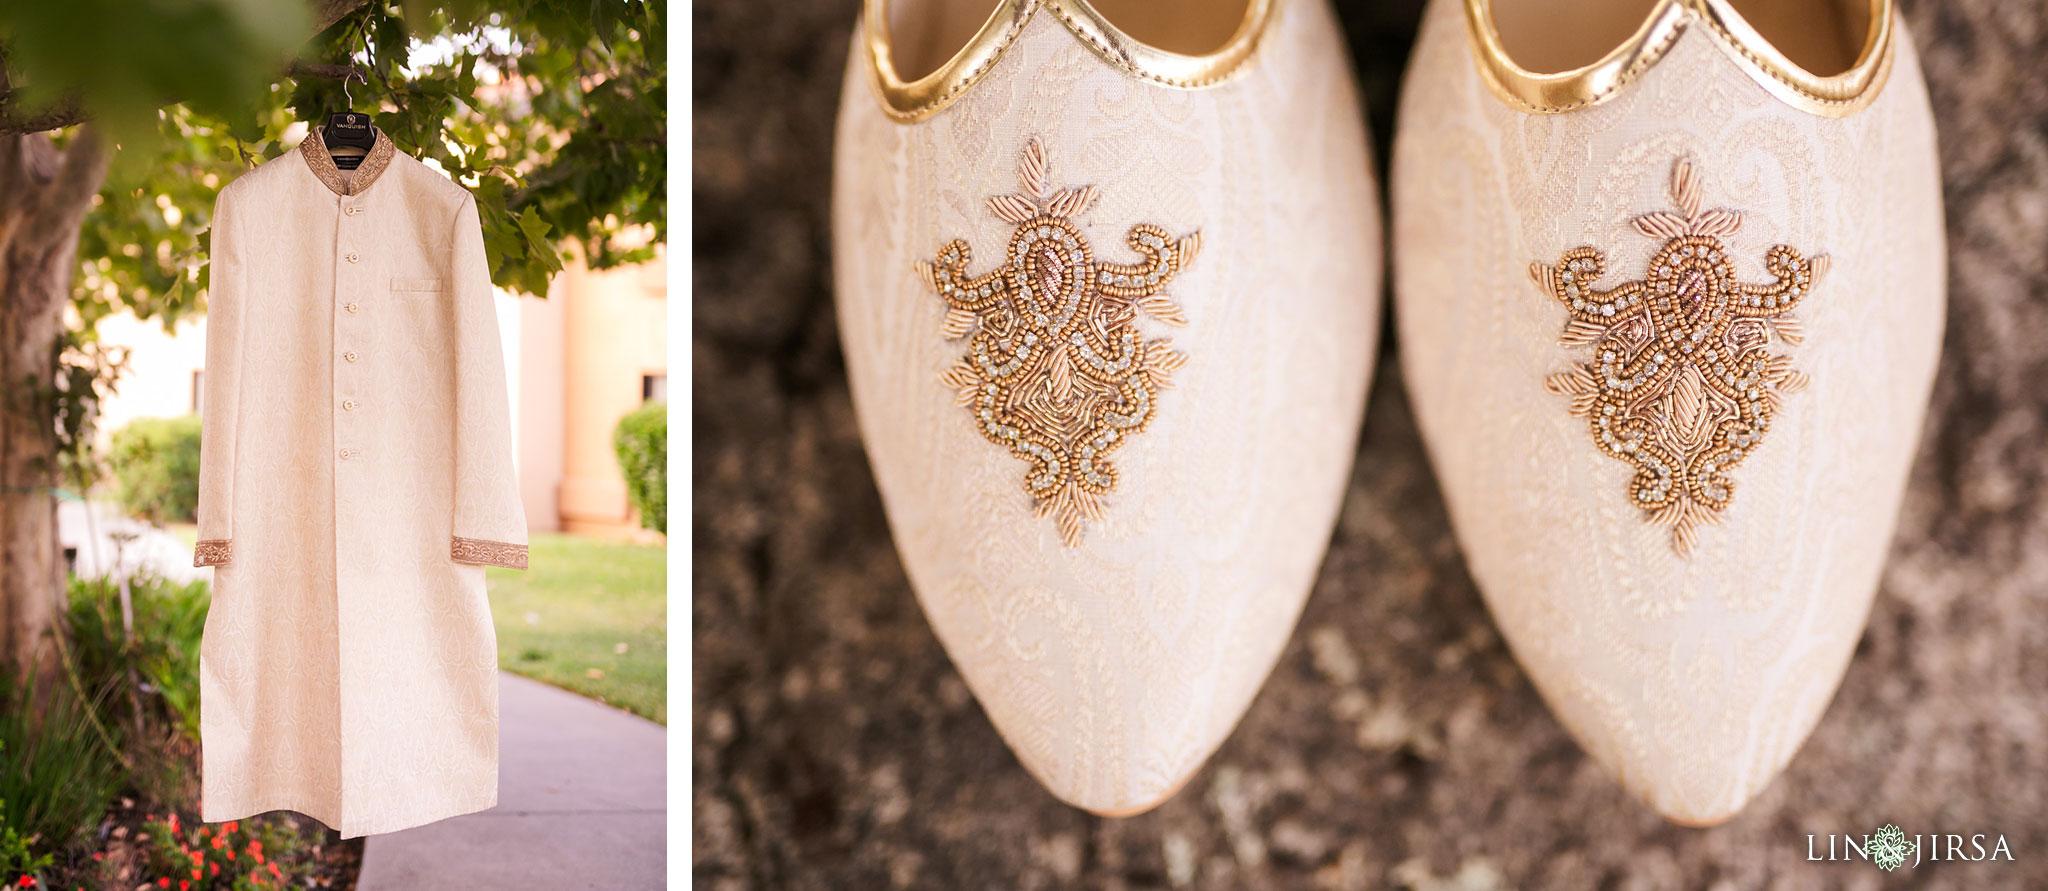 012 san francisco sikh center punjabi wedding photography